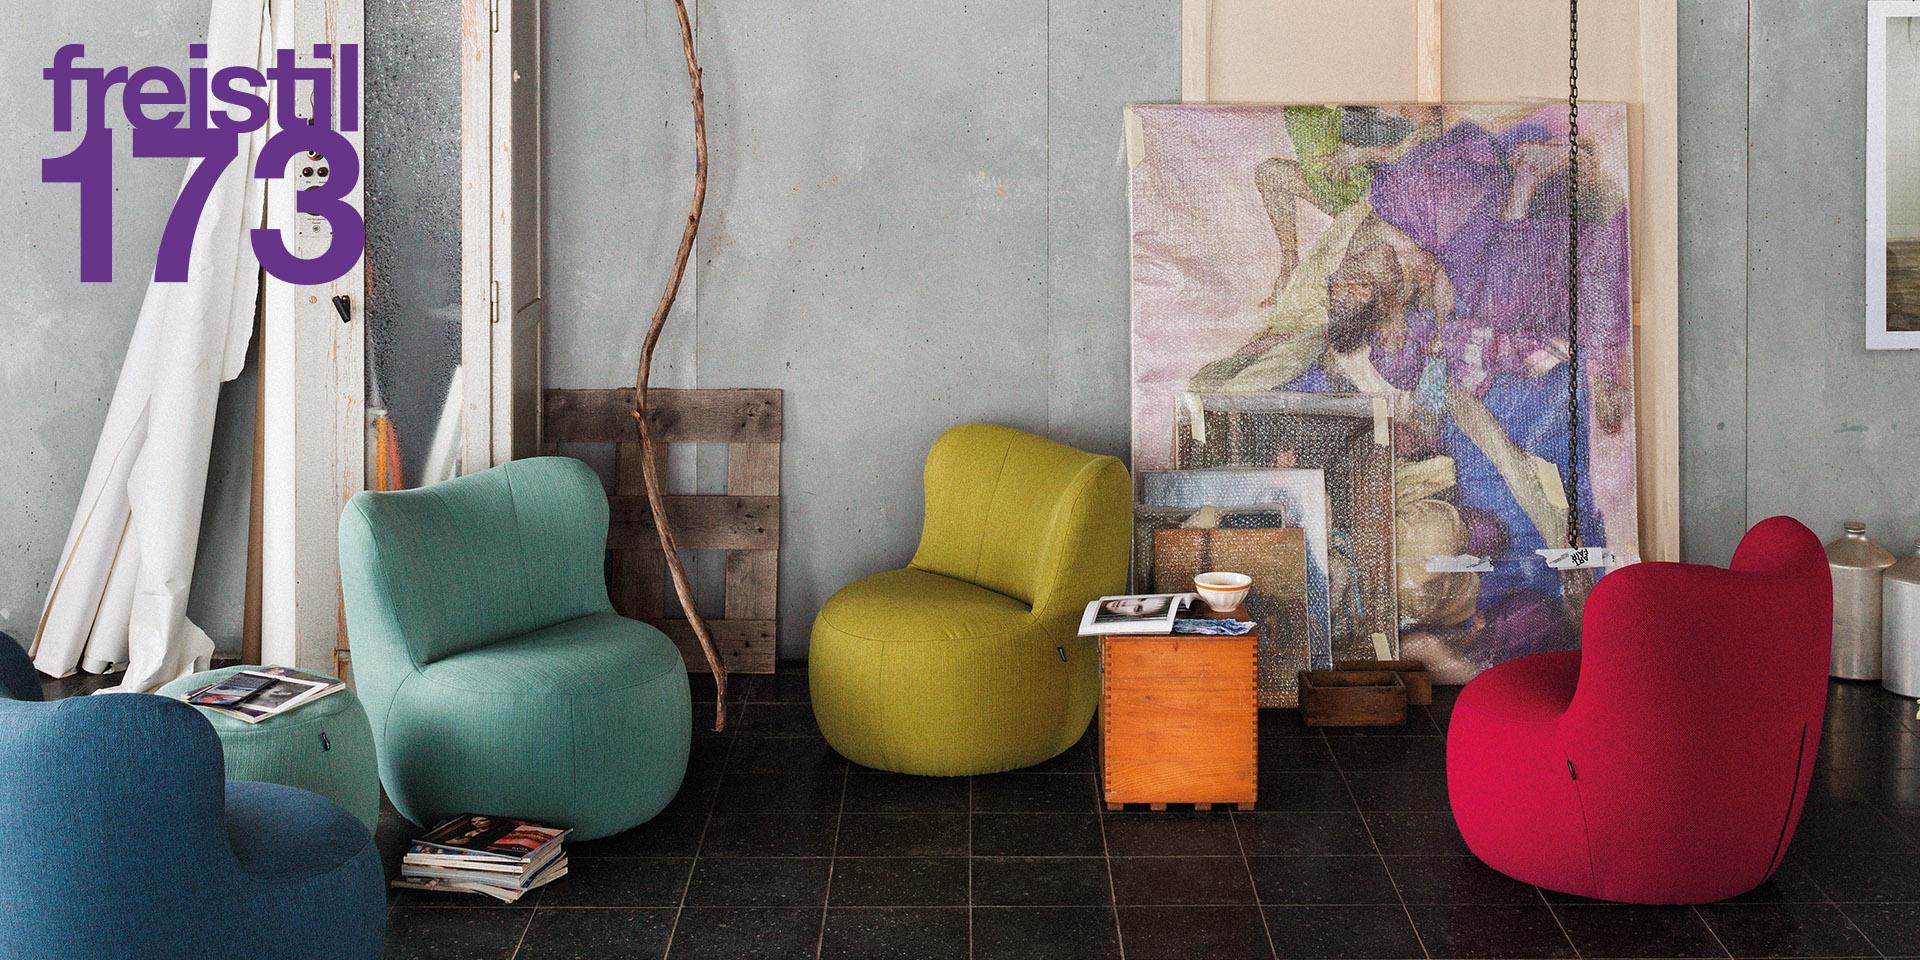 freistil 173 header fenchel wohnfaszination gmbh. Black Bedroom Furniture Sets. Home Design Ideas